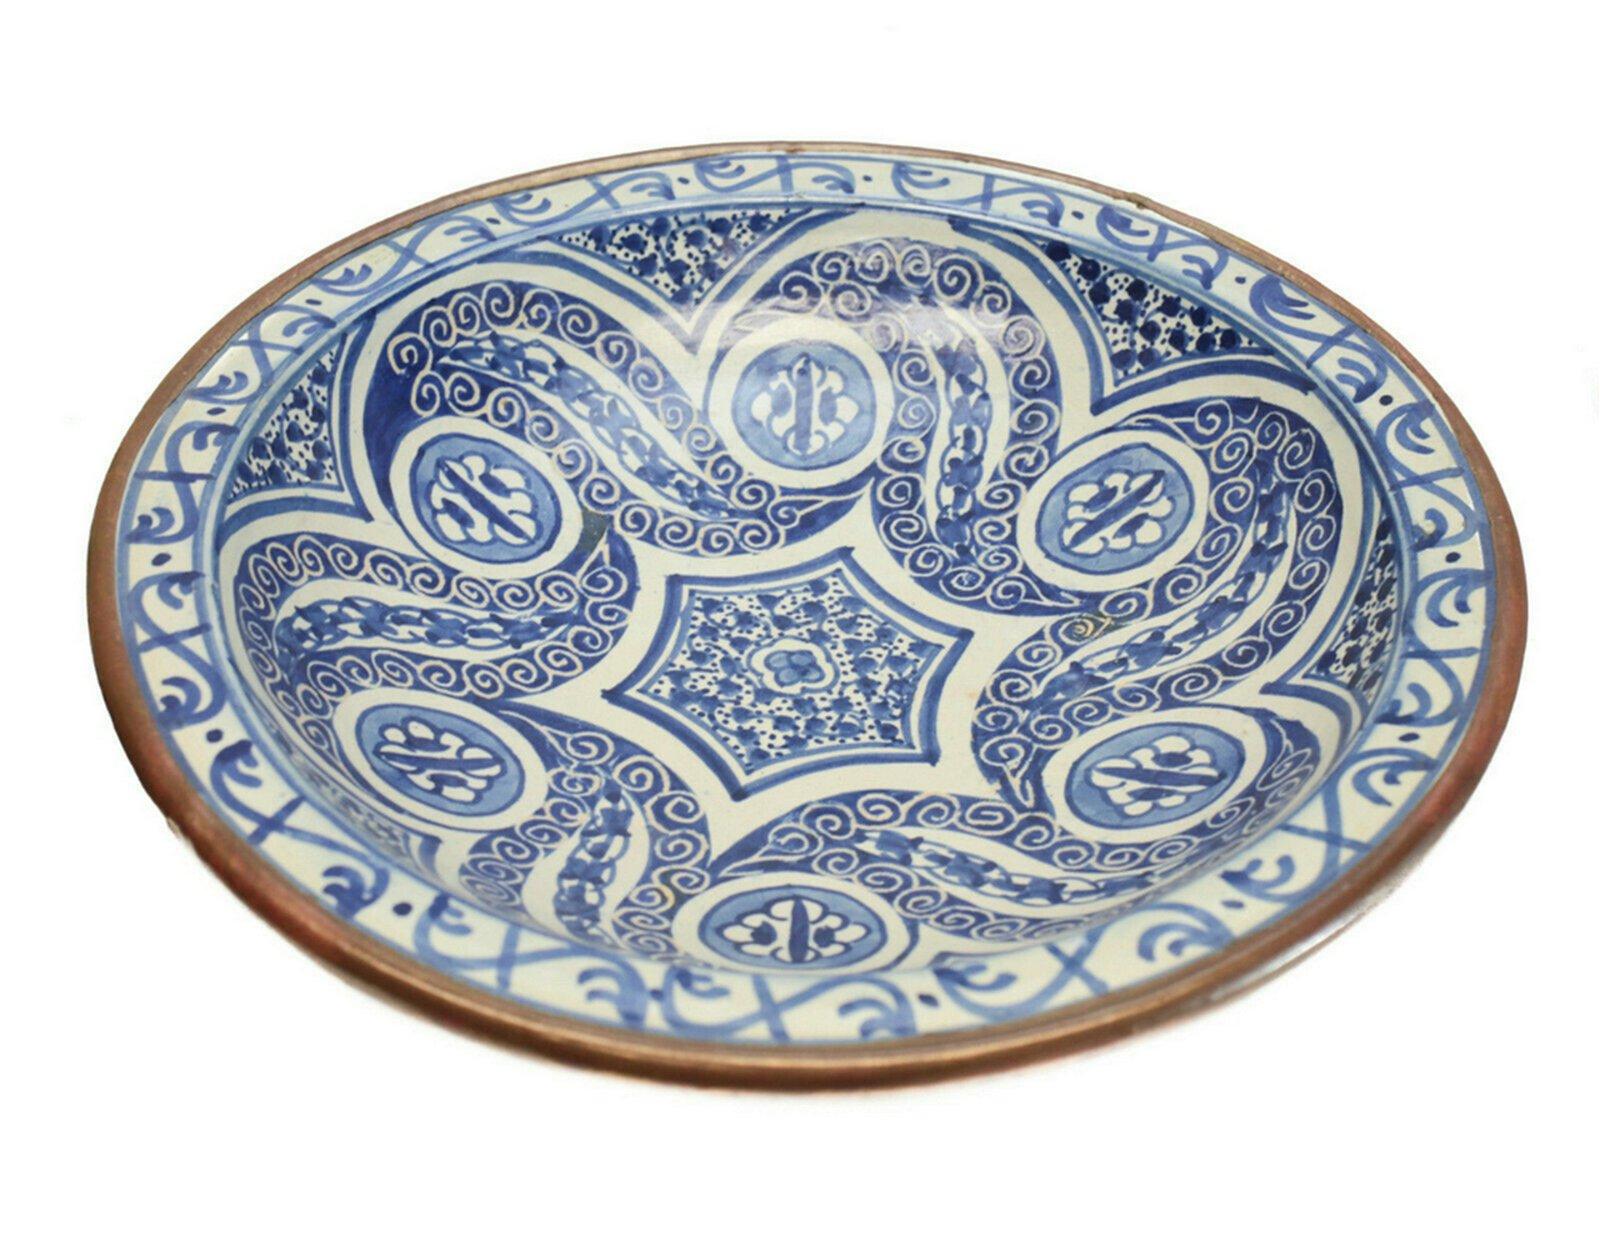 Hispano Moresque Pottery Bowl, 19th C.